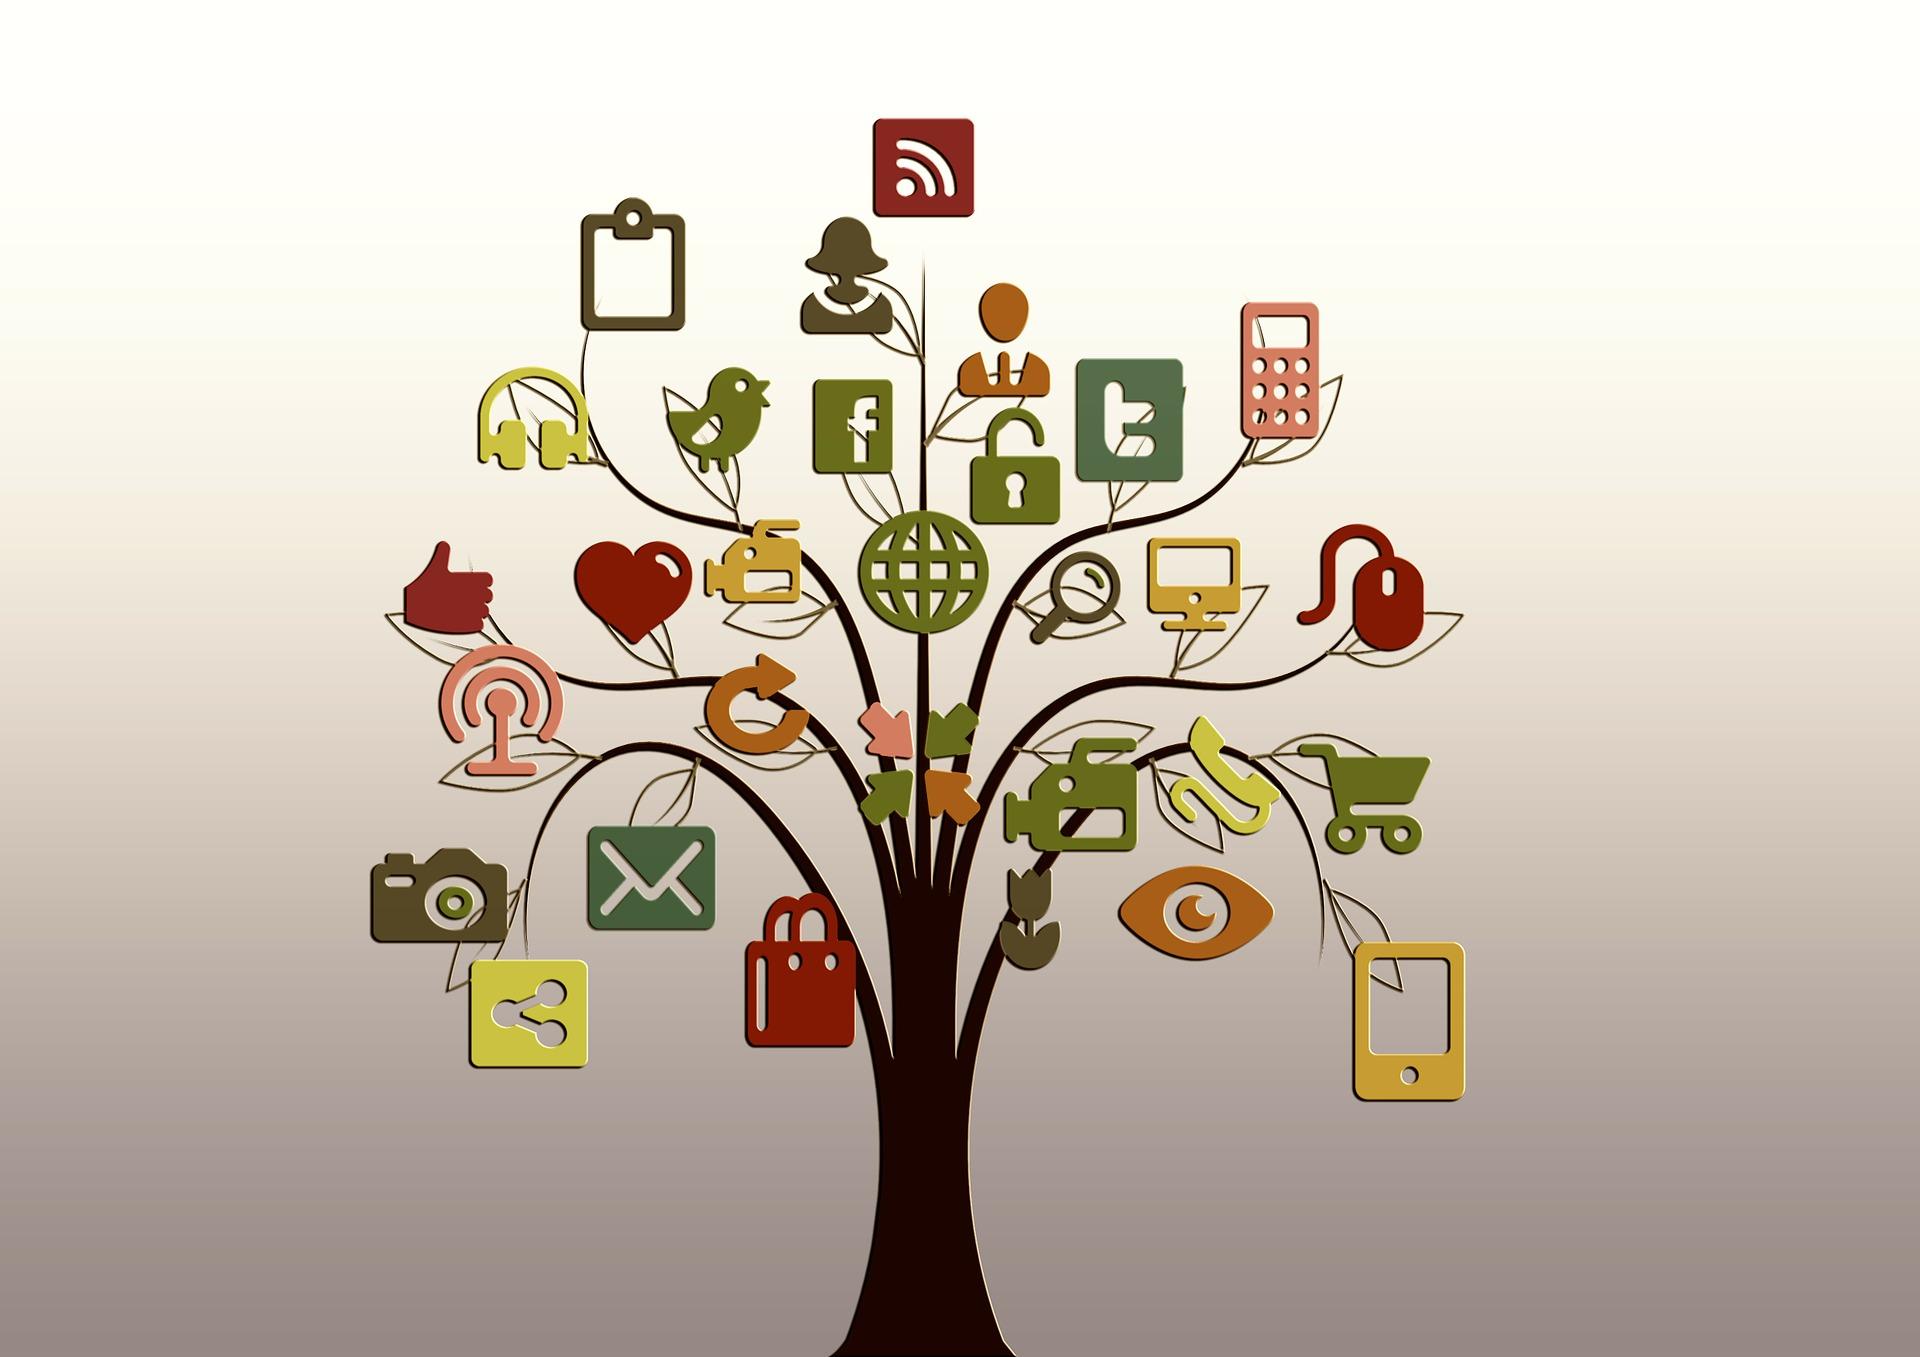 Digitization_Tree_L.jpg